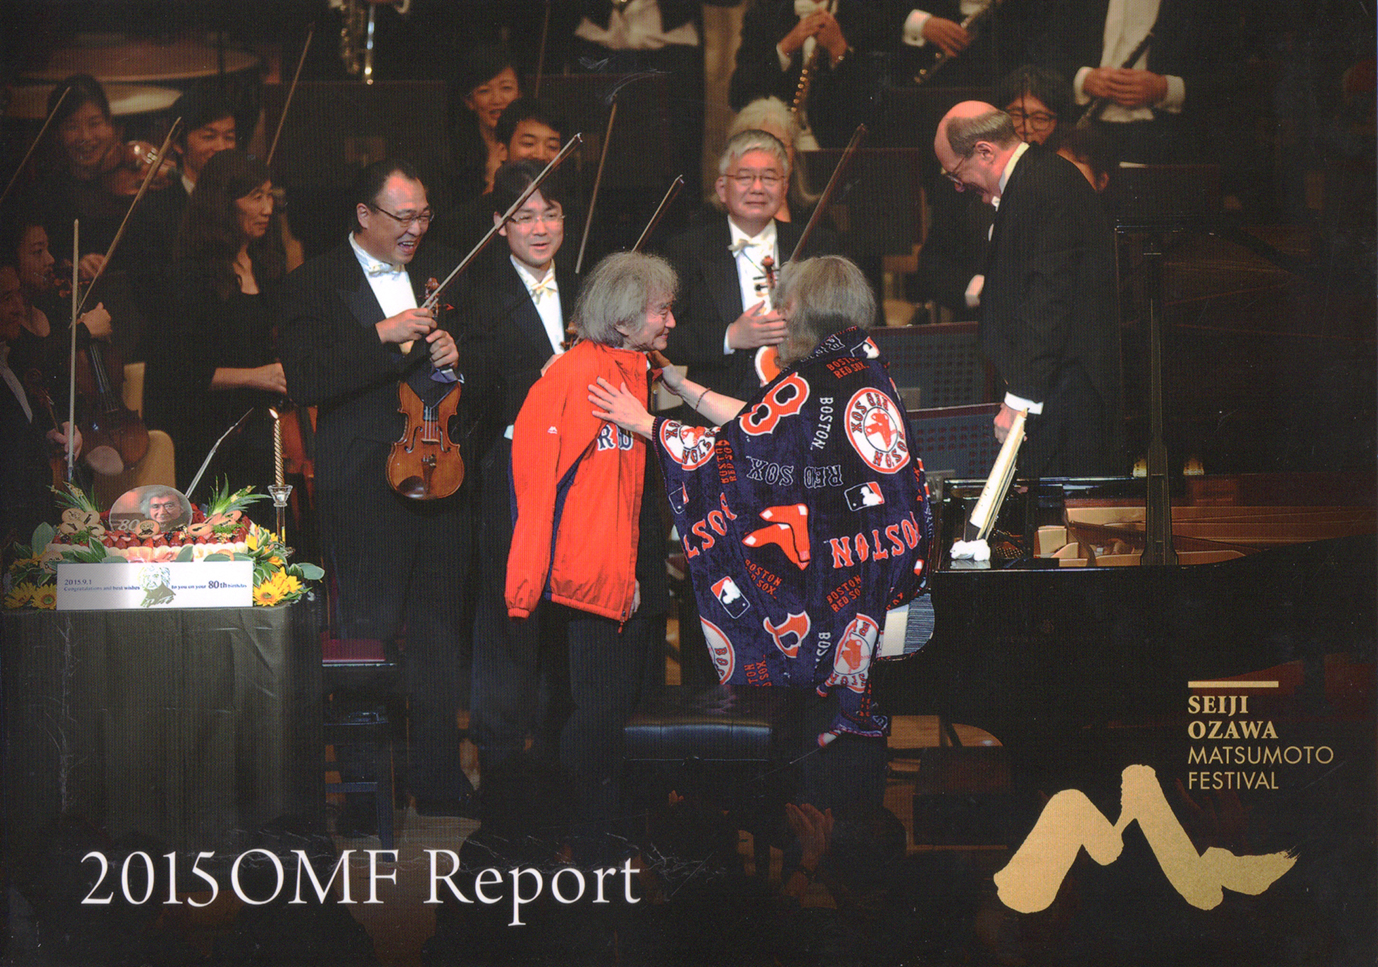 2015 OMFレポート